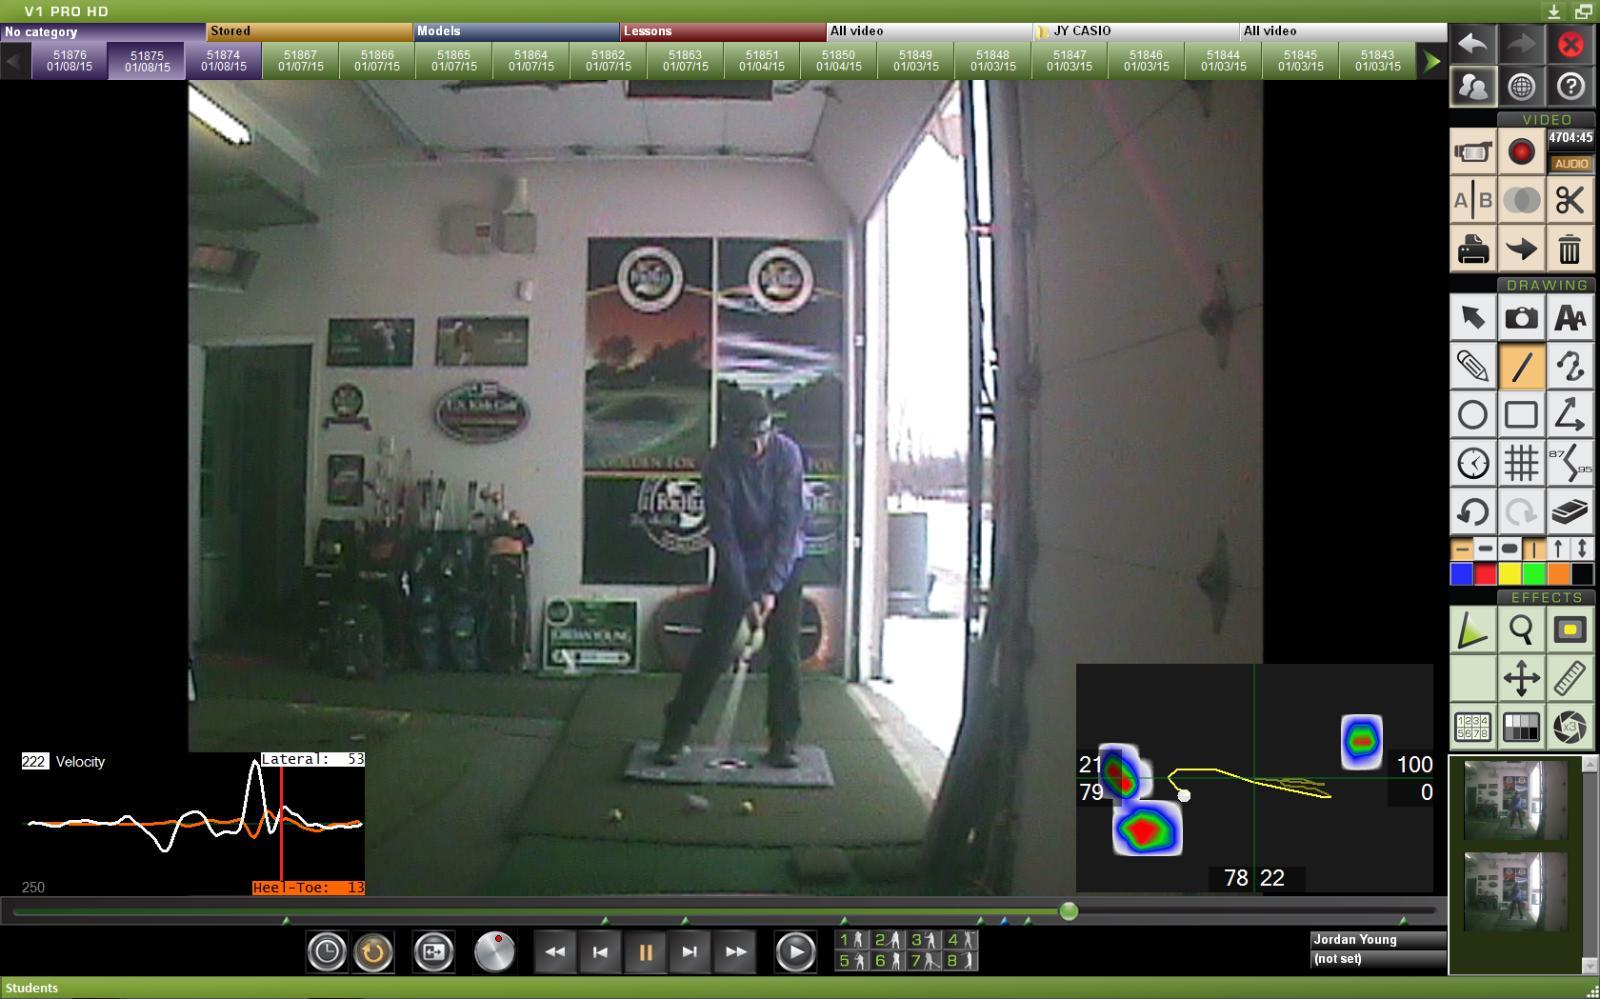 V1-HD-BodiTrak-screen-shot.png